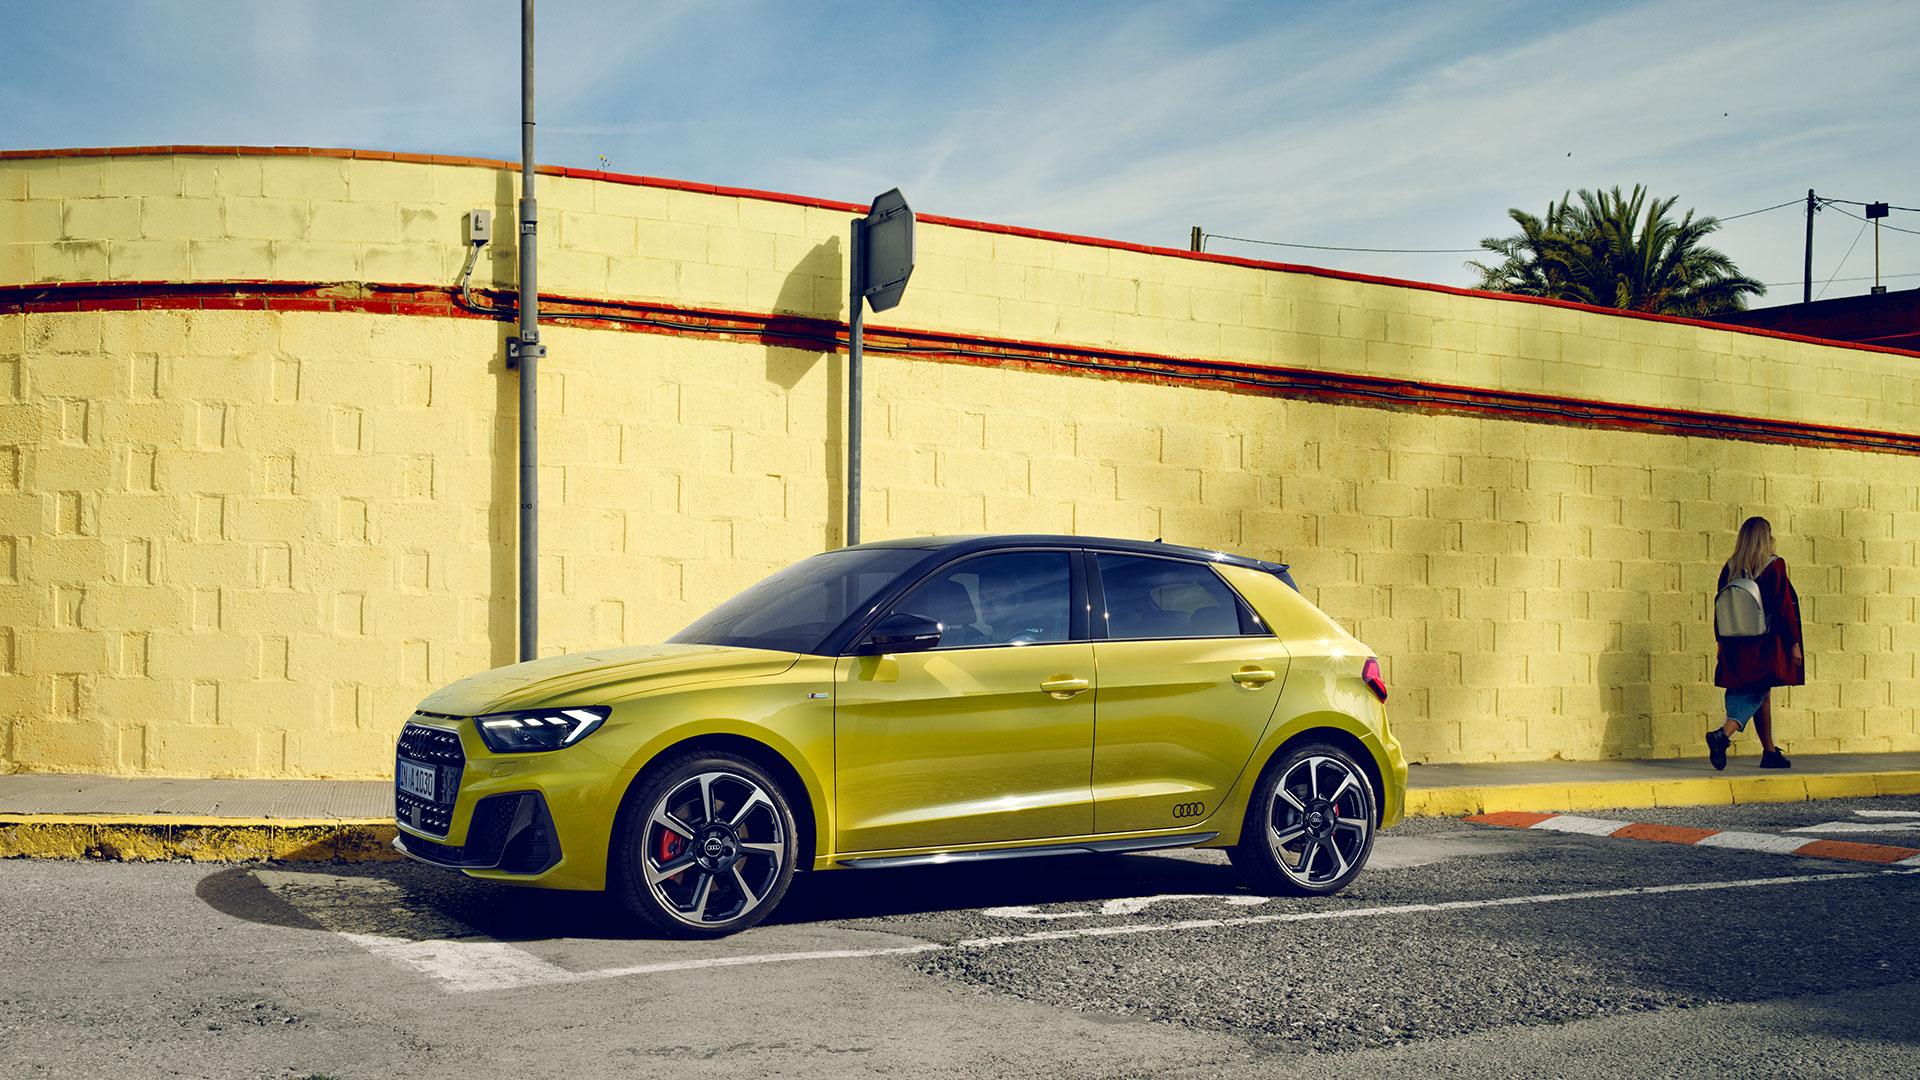 Nuova Audi A1 Sportback. Scopriamola insieme!